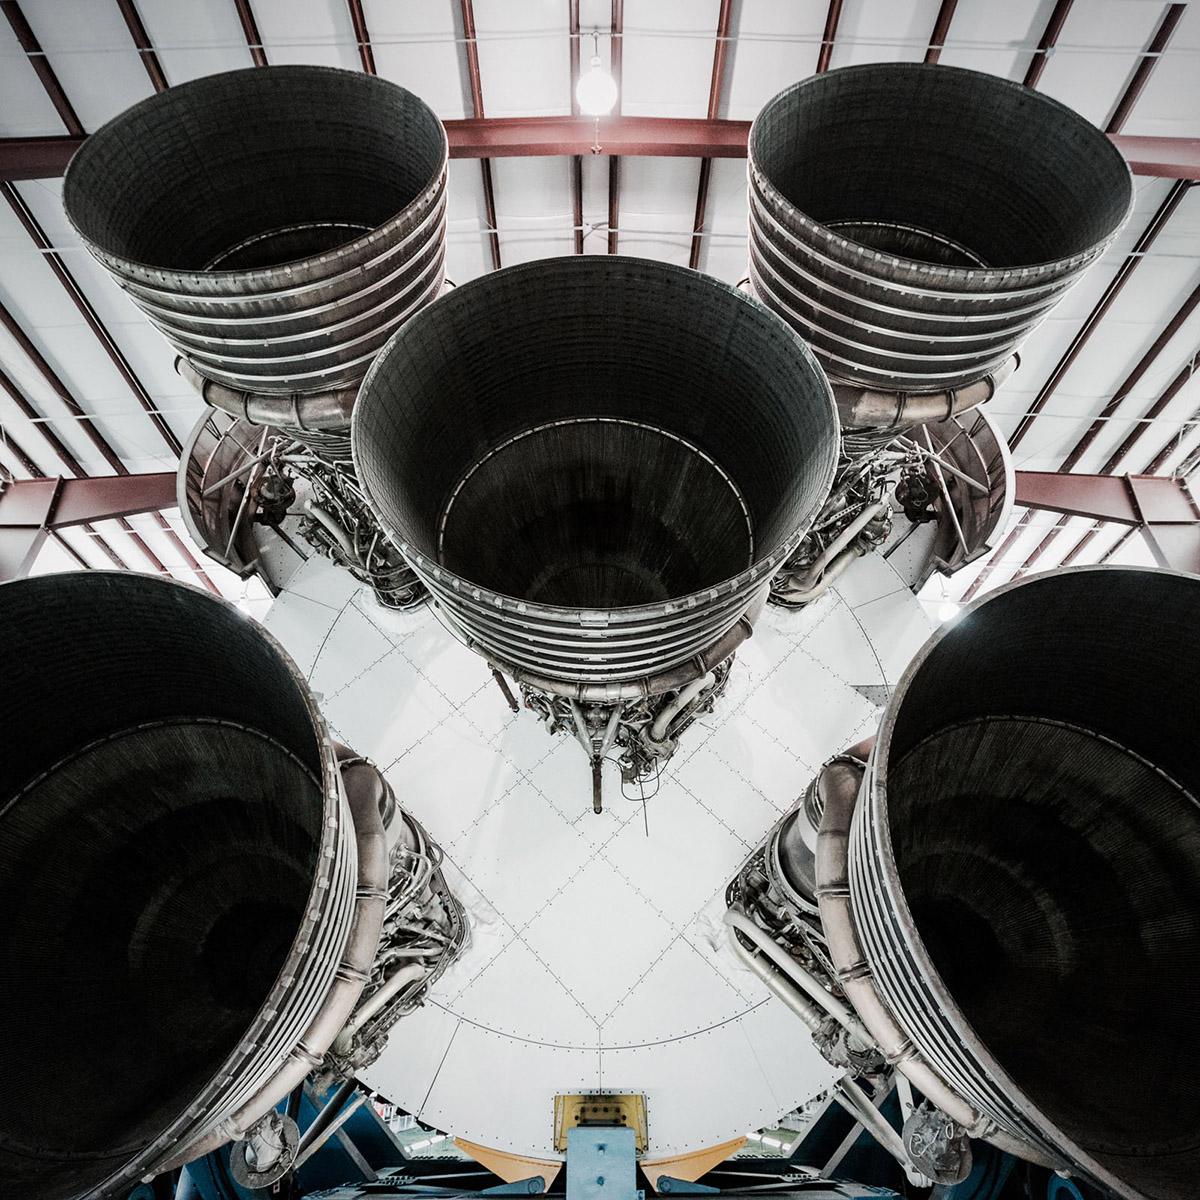 Rocket Engines at NASA Space Center by Jordan Reeder